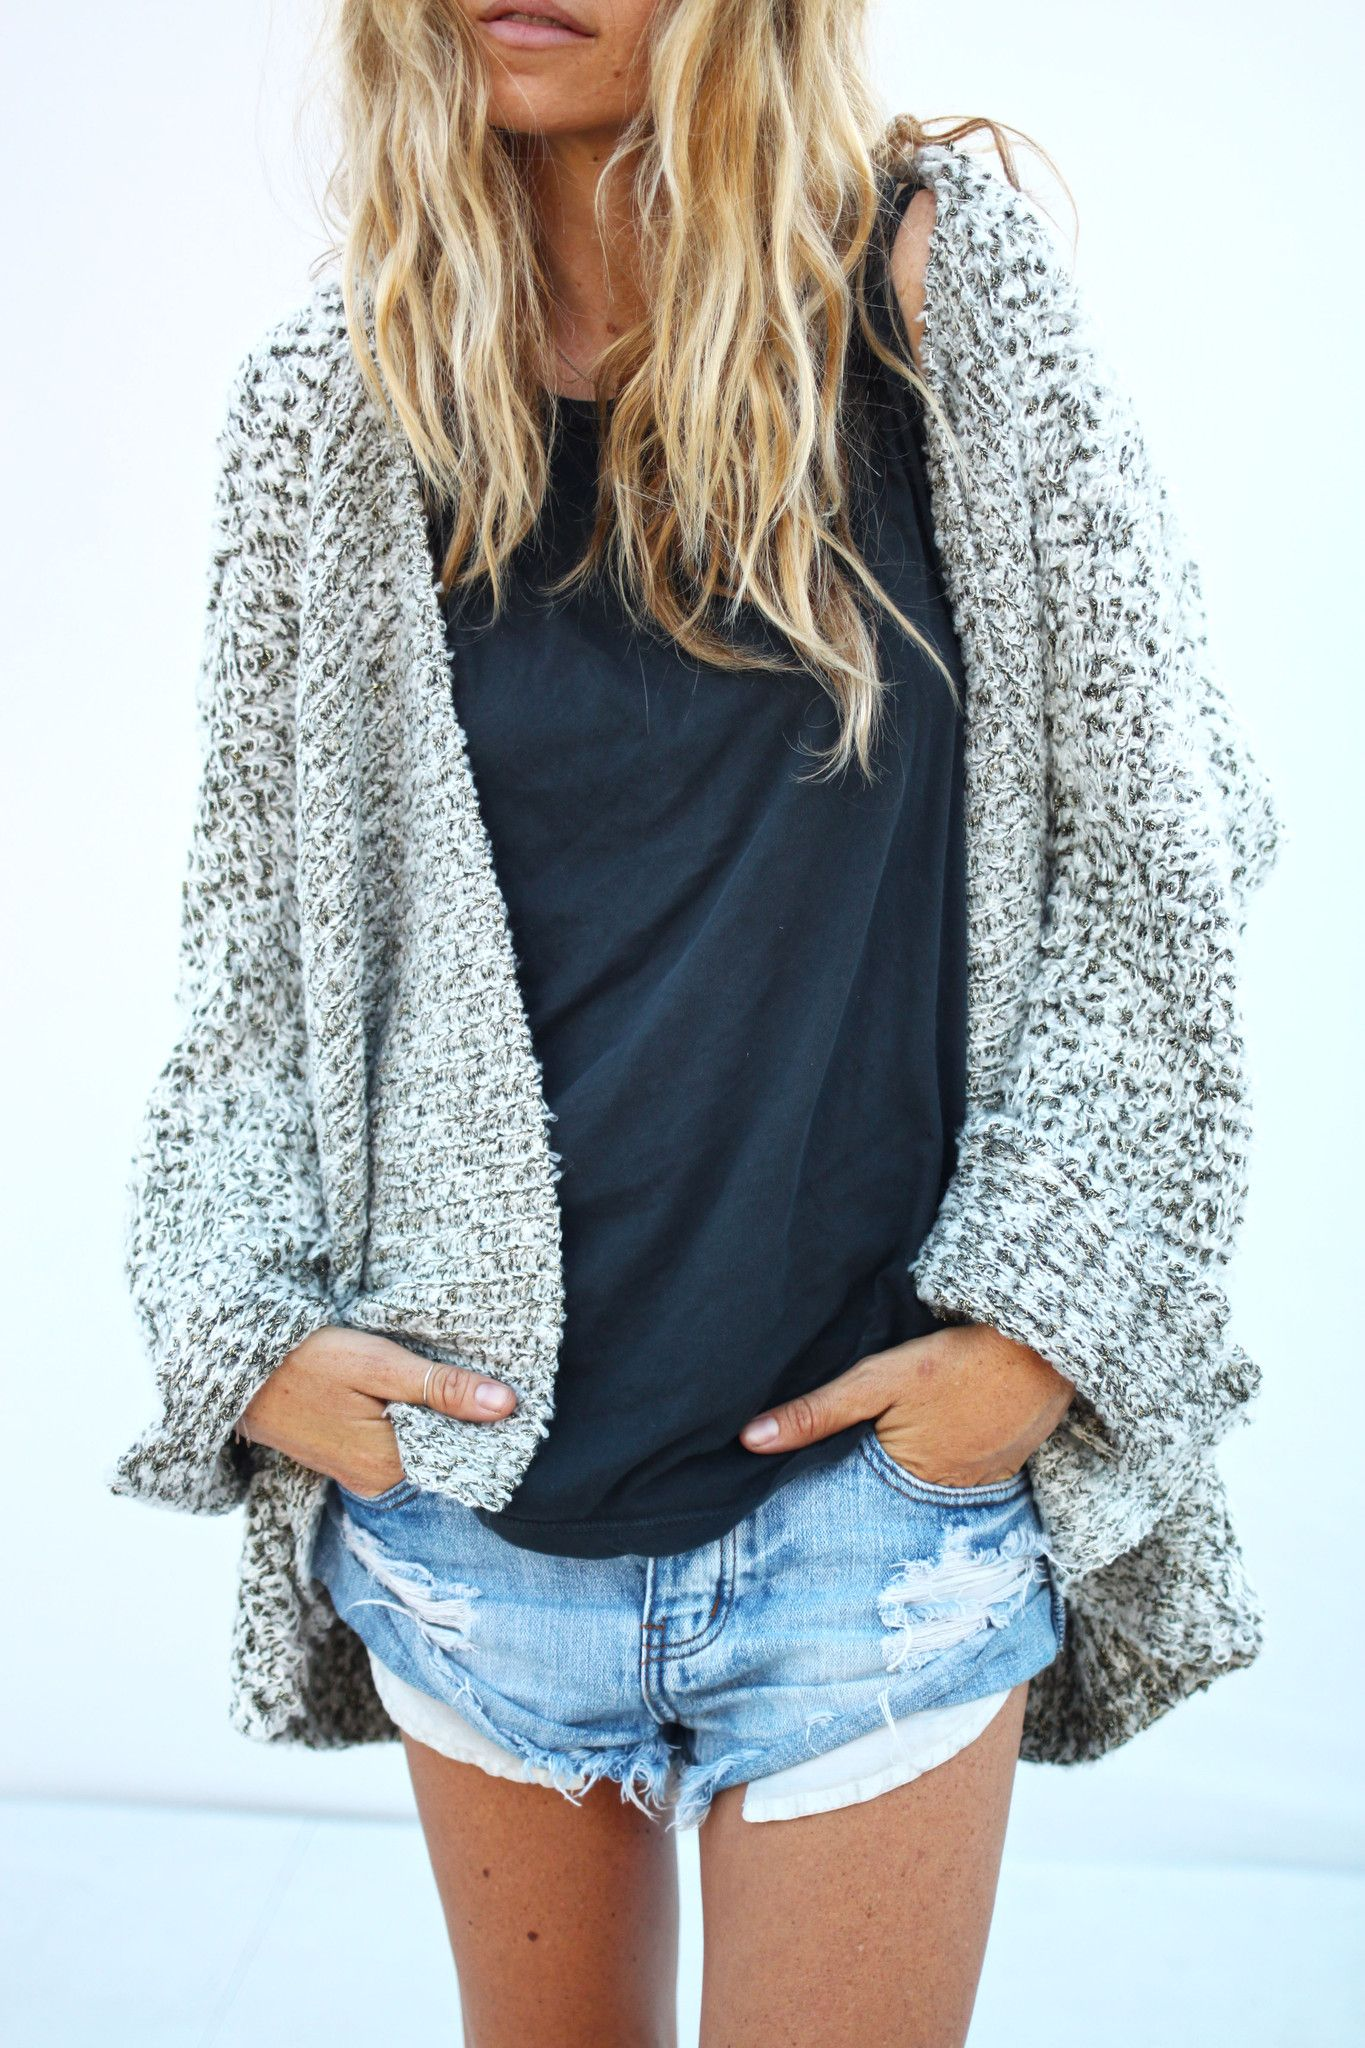 morrison sweater style pinterest moda ropa. Black Bedroom Furniture Sets. Home Design Ideas